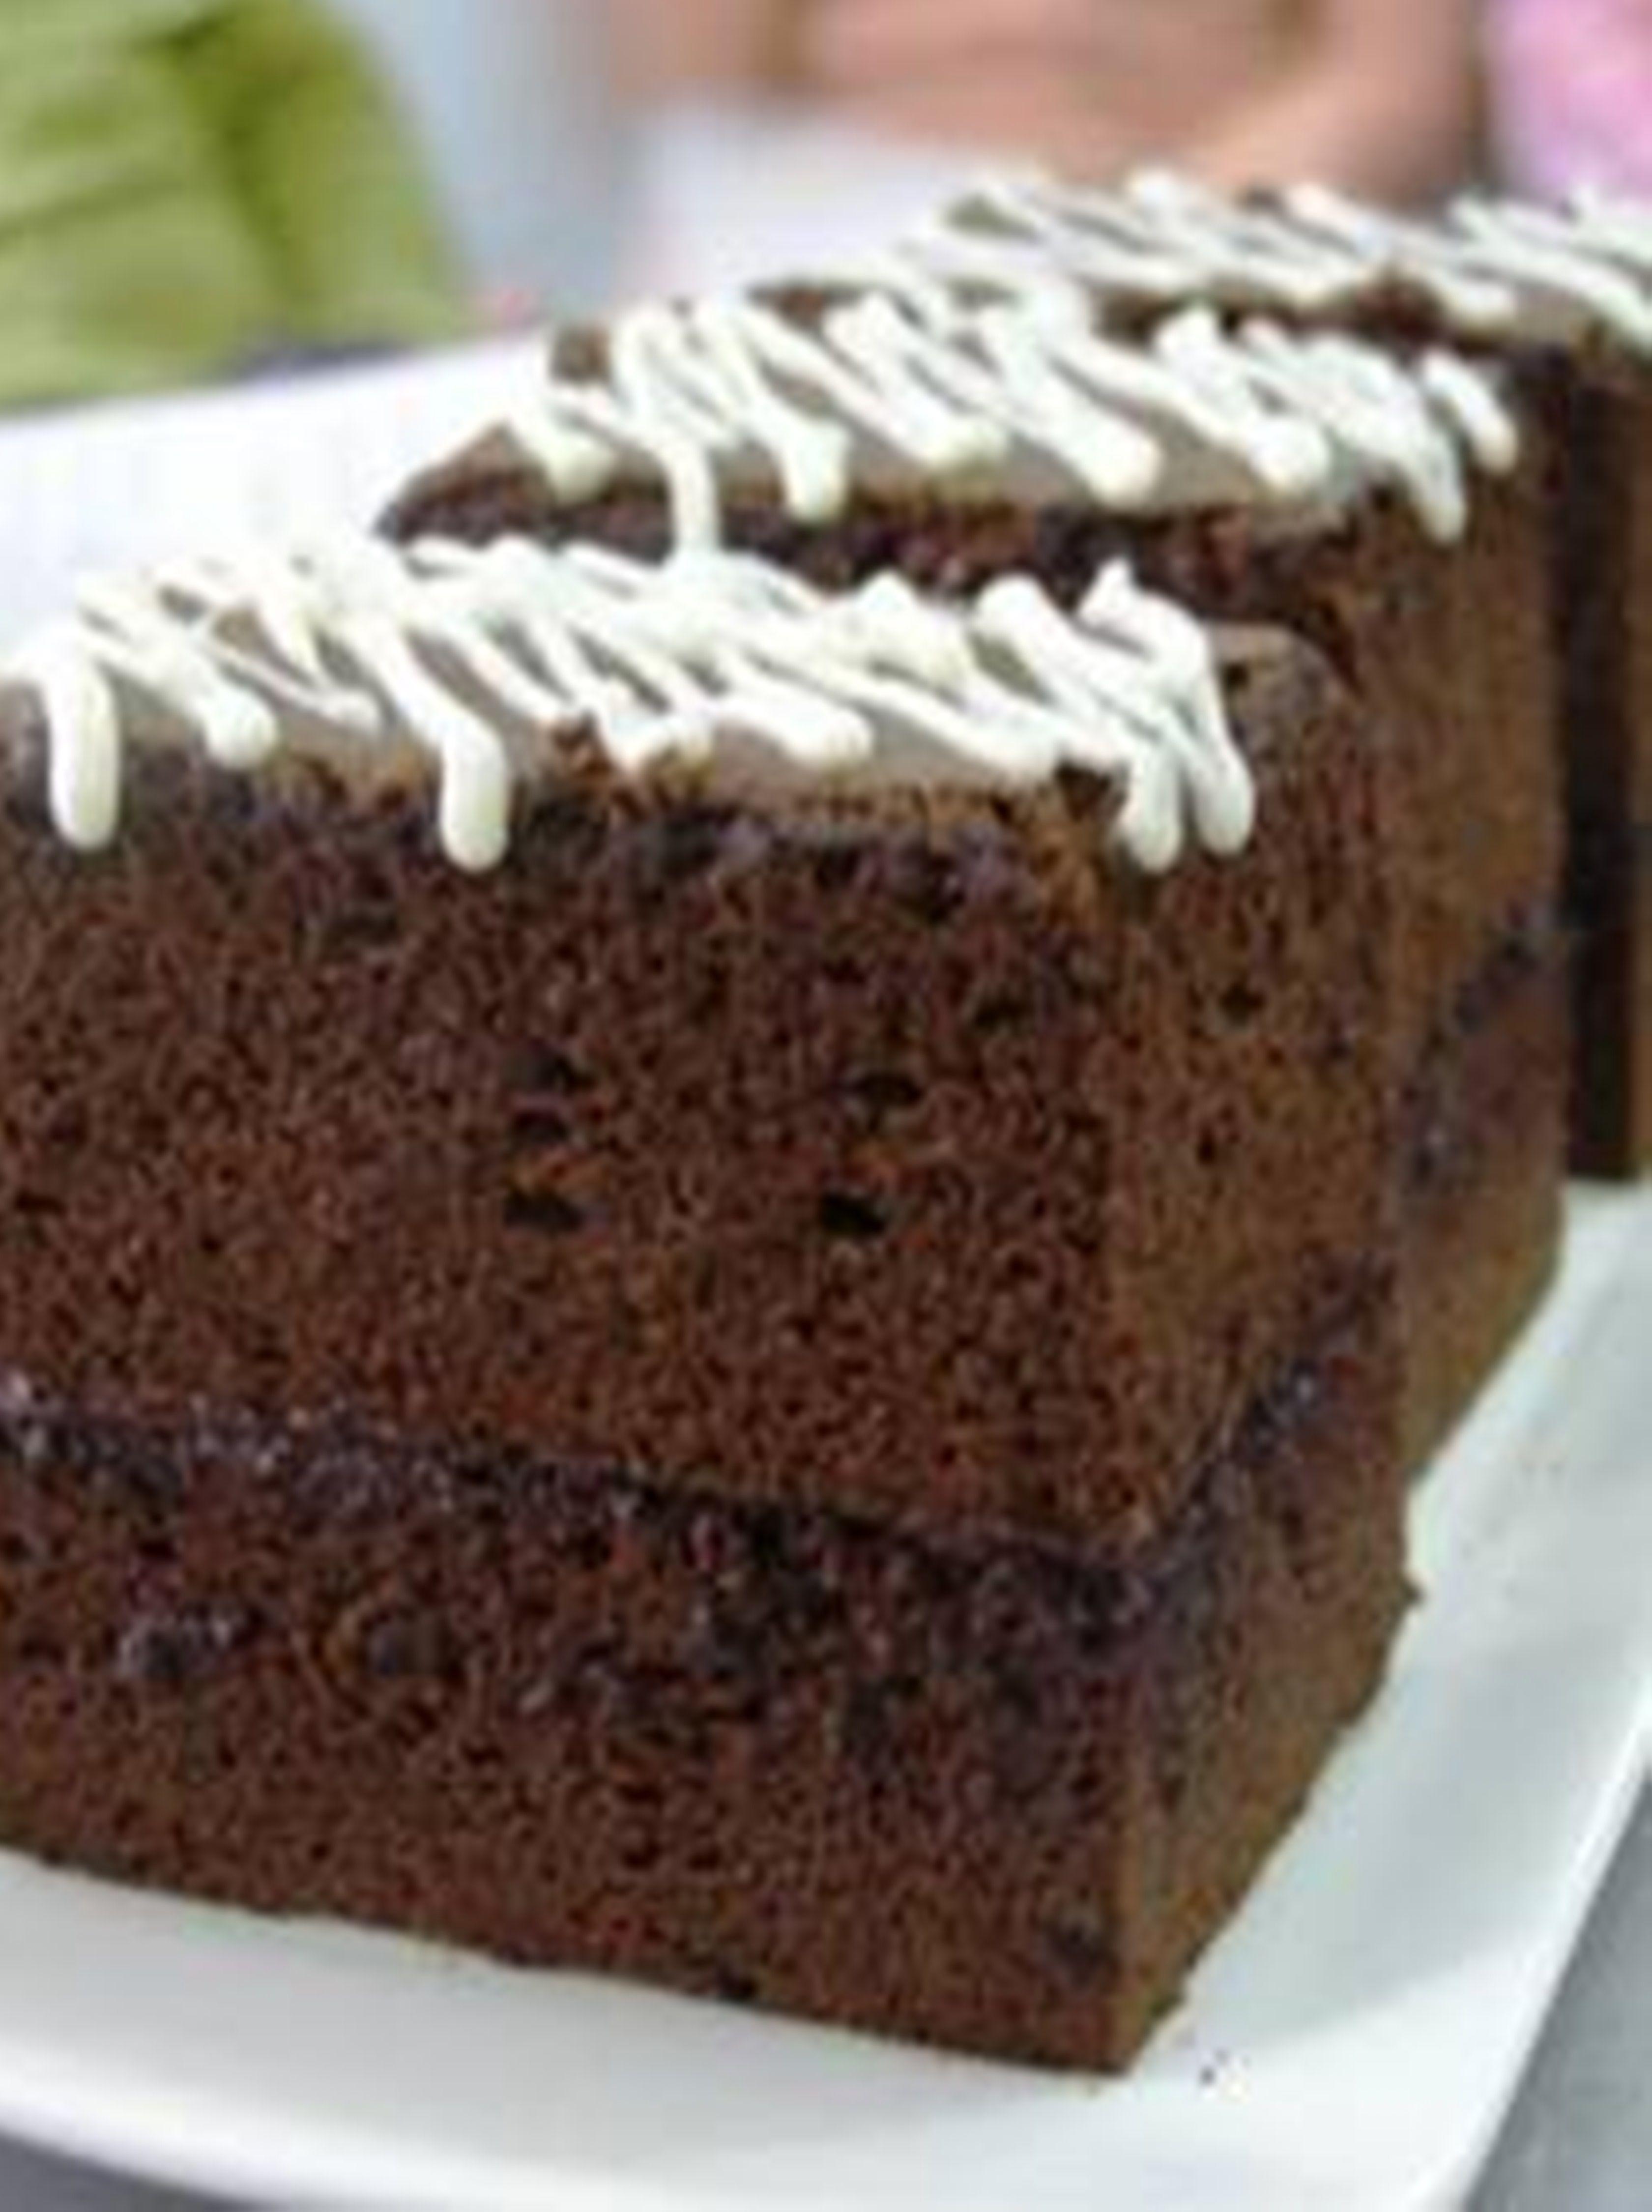 Cara Menghias Kue Brownies Kukus : menghias, brownies, kukus, Koleski, Terbaik, Membuat, Brownies, Coklat, Kukus, Cummings